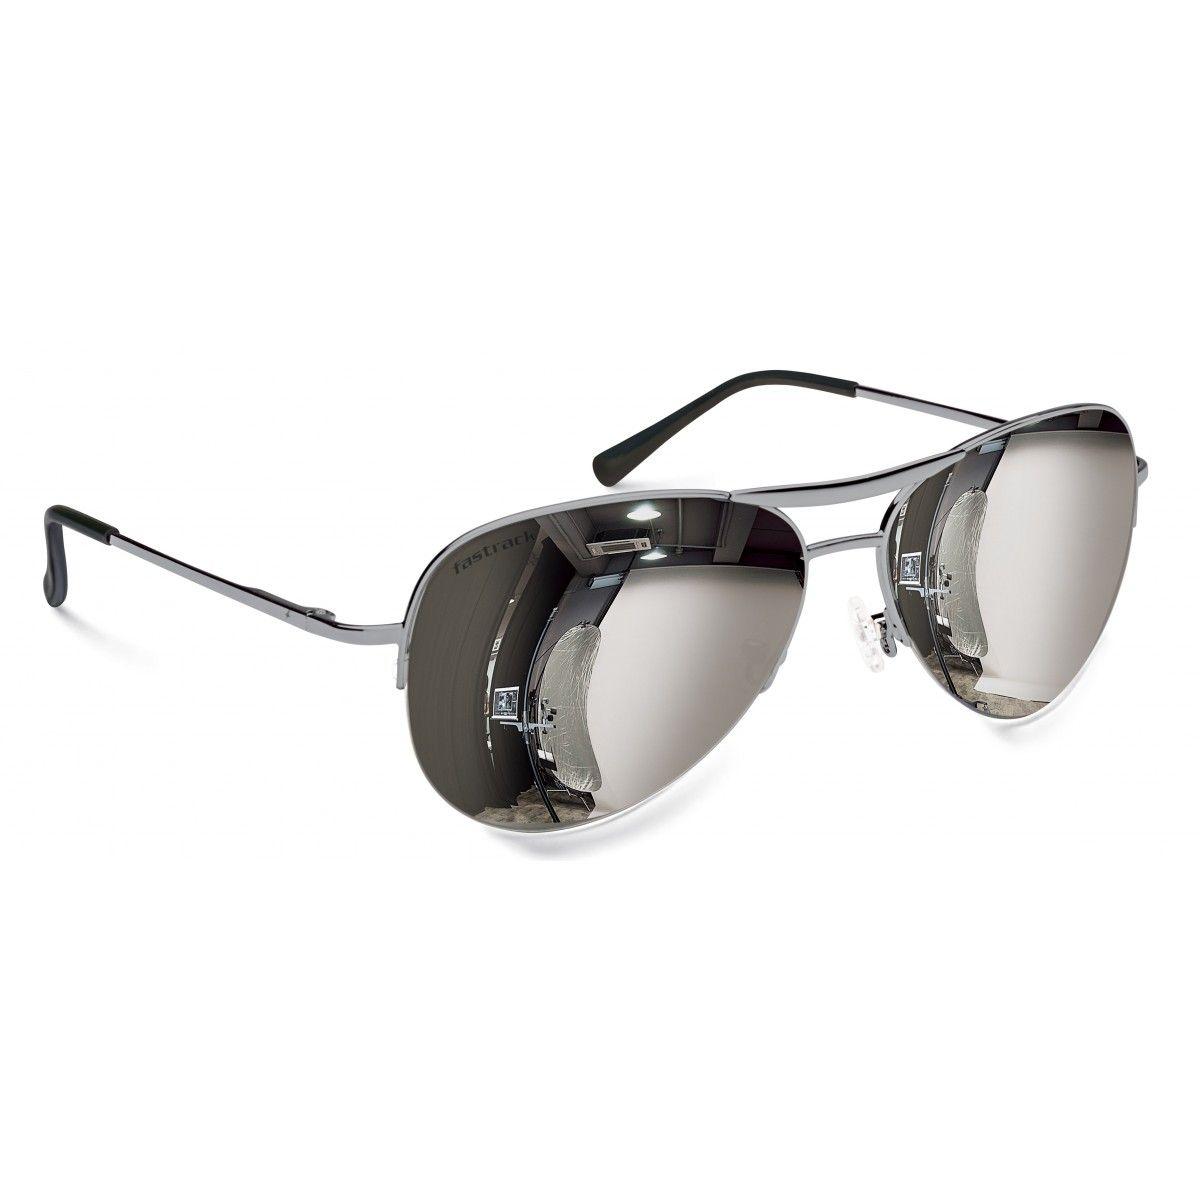 46c12ba2b5 Girl Aviator Sunglasses I really like these